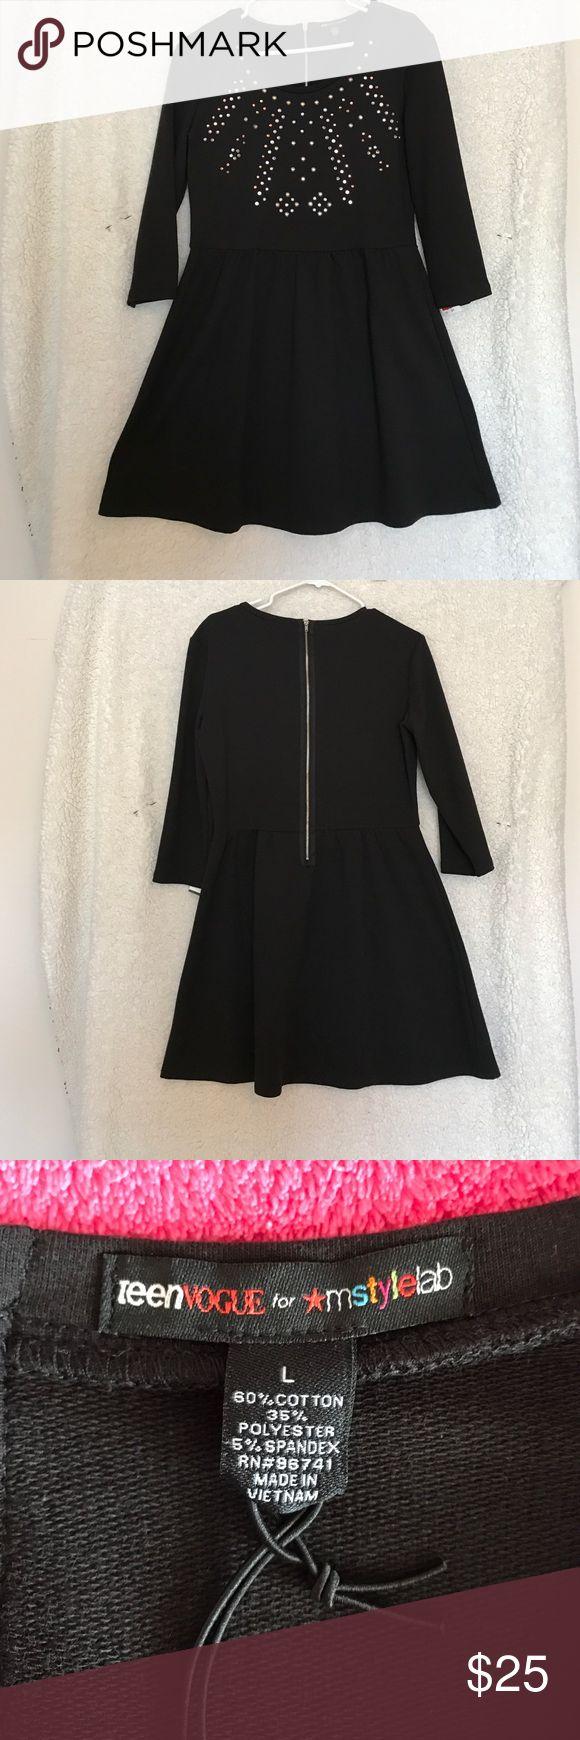 Teen Vogue Black Rhinestone Dress New With Tags Teen Vogue Black Rhinestone Dress. No Trades Please TeenVogue  Dresses Long Sleeve